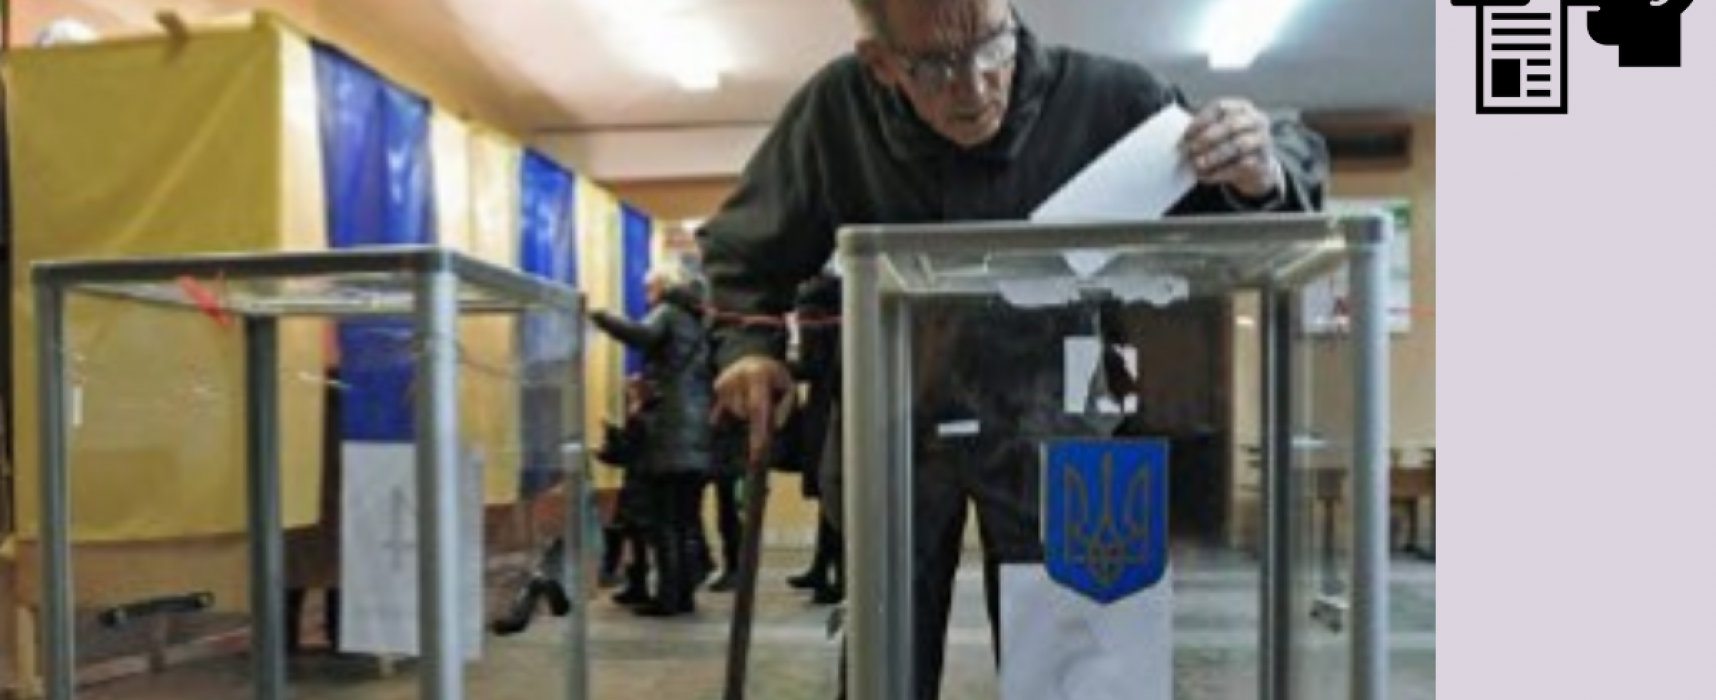 Fake: Ukraine Denies German Election Observers Accreditation